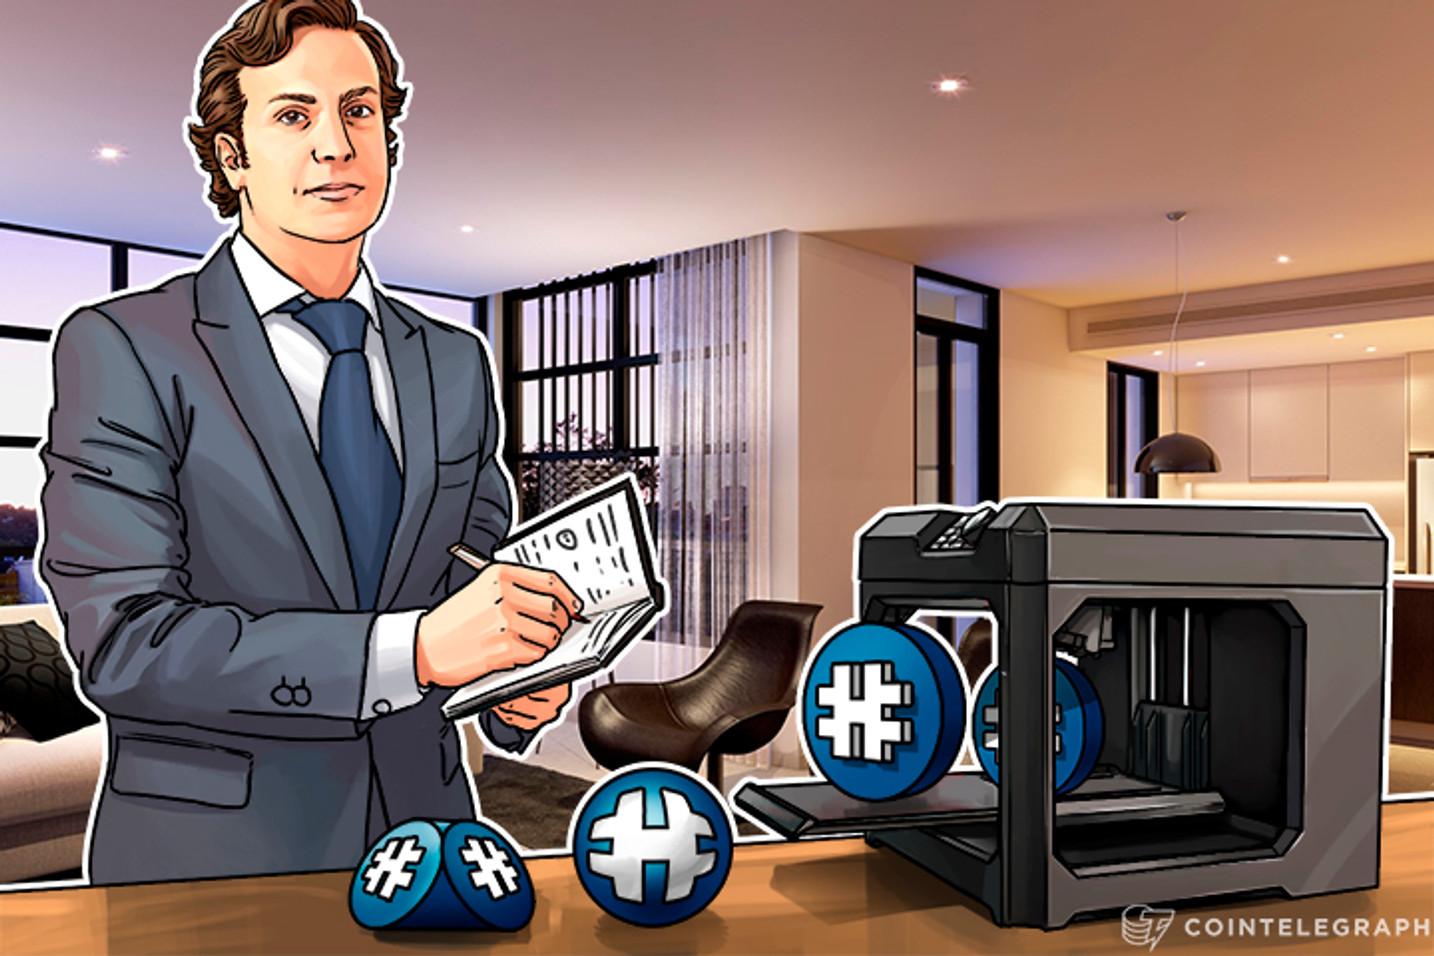 Abibas, Rebok, Samcung: How Blockchain, IoT Can Help Beat Counterfeiters